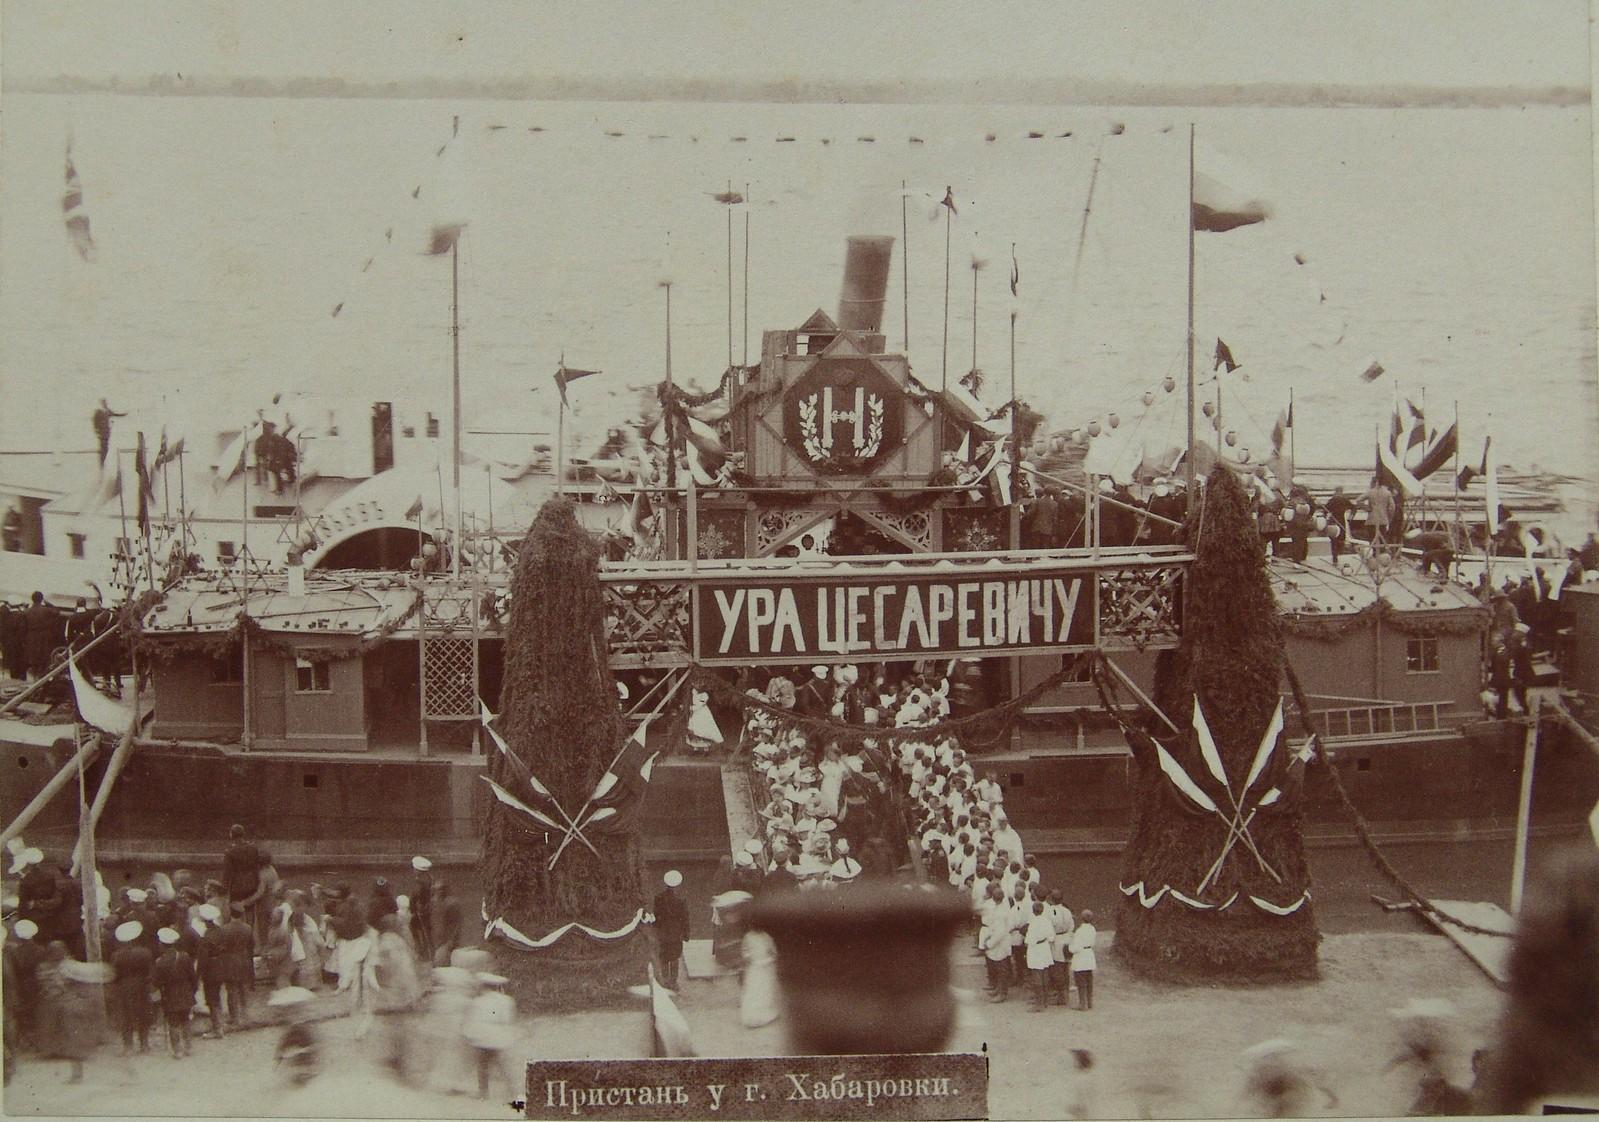 03. 1891. Пристань у города Хабаровки